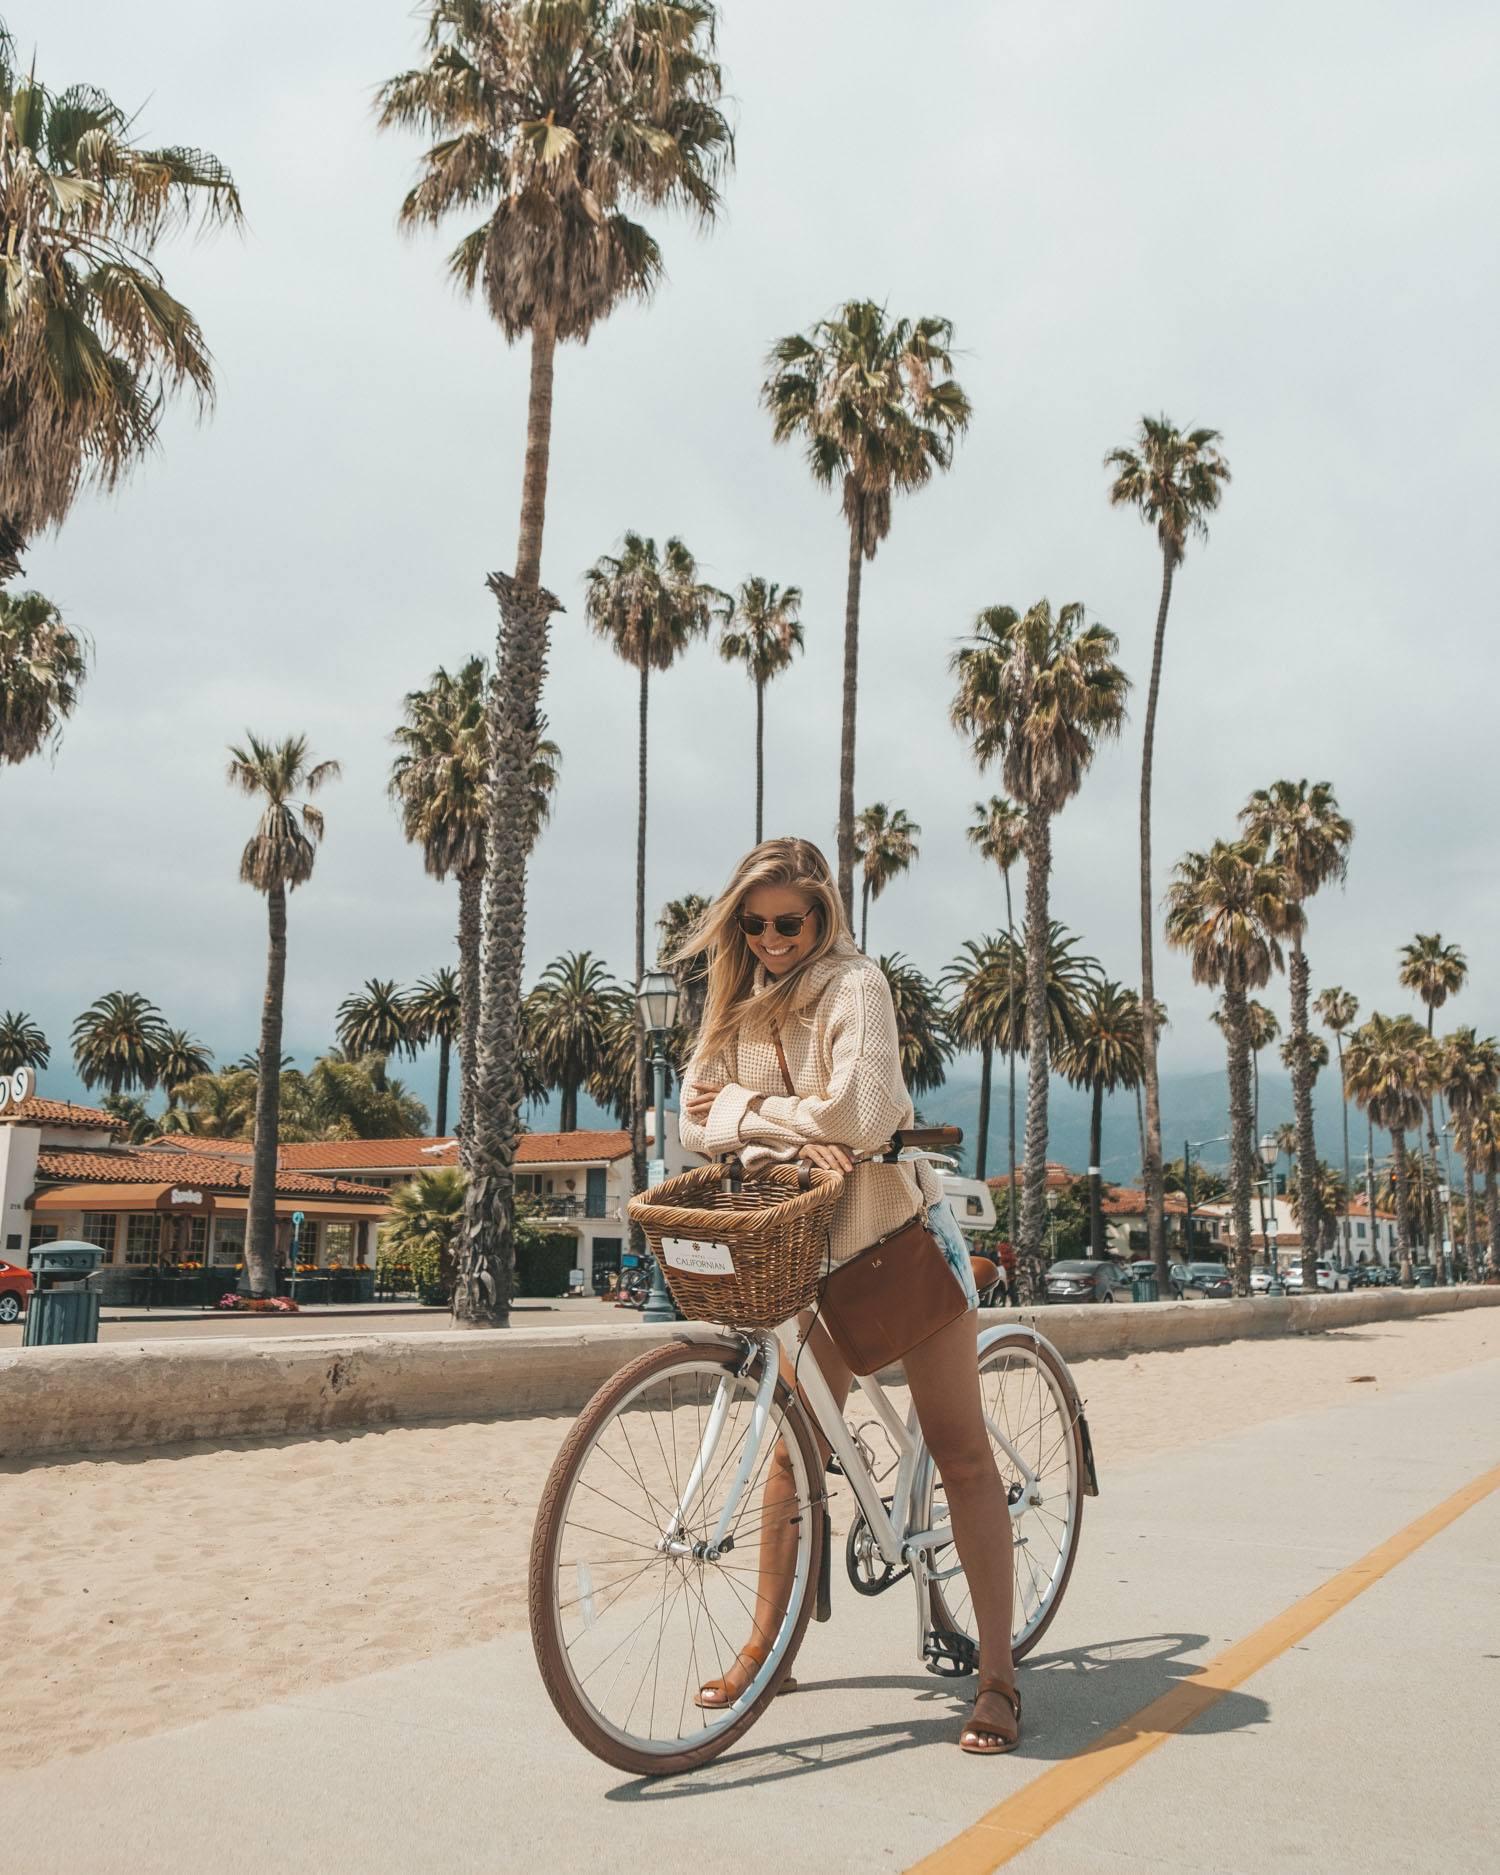 Southern California Bike Blonde Girl Palm Trees